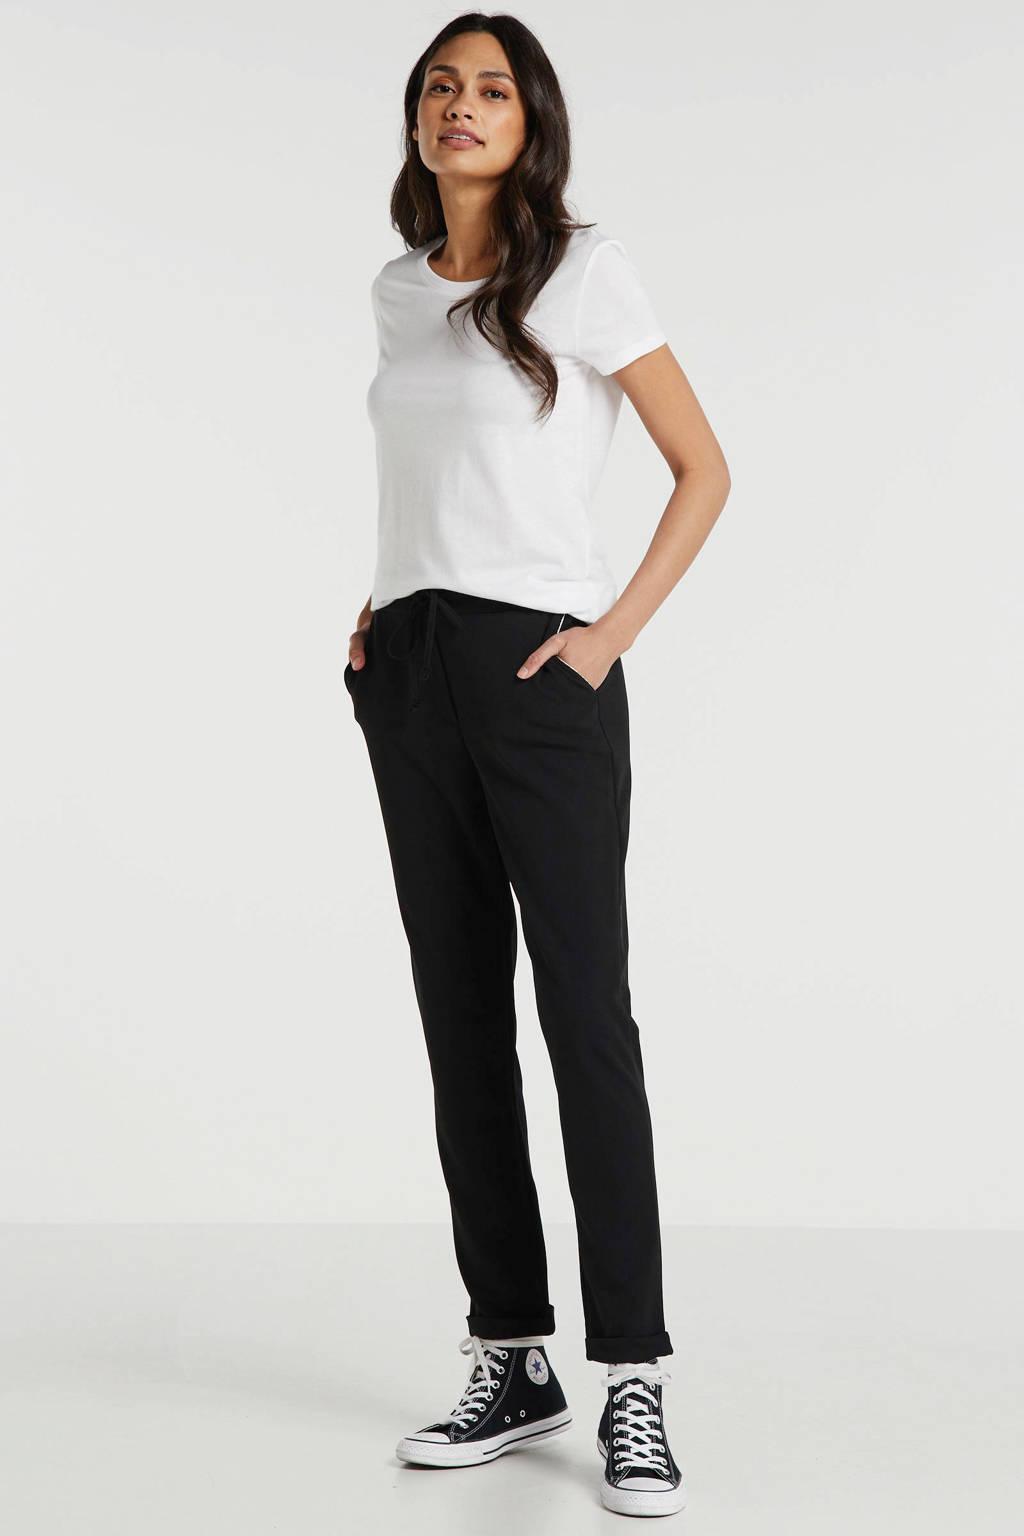 GAP T-shirt - (set van 2), Zwart/wit